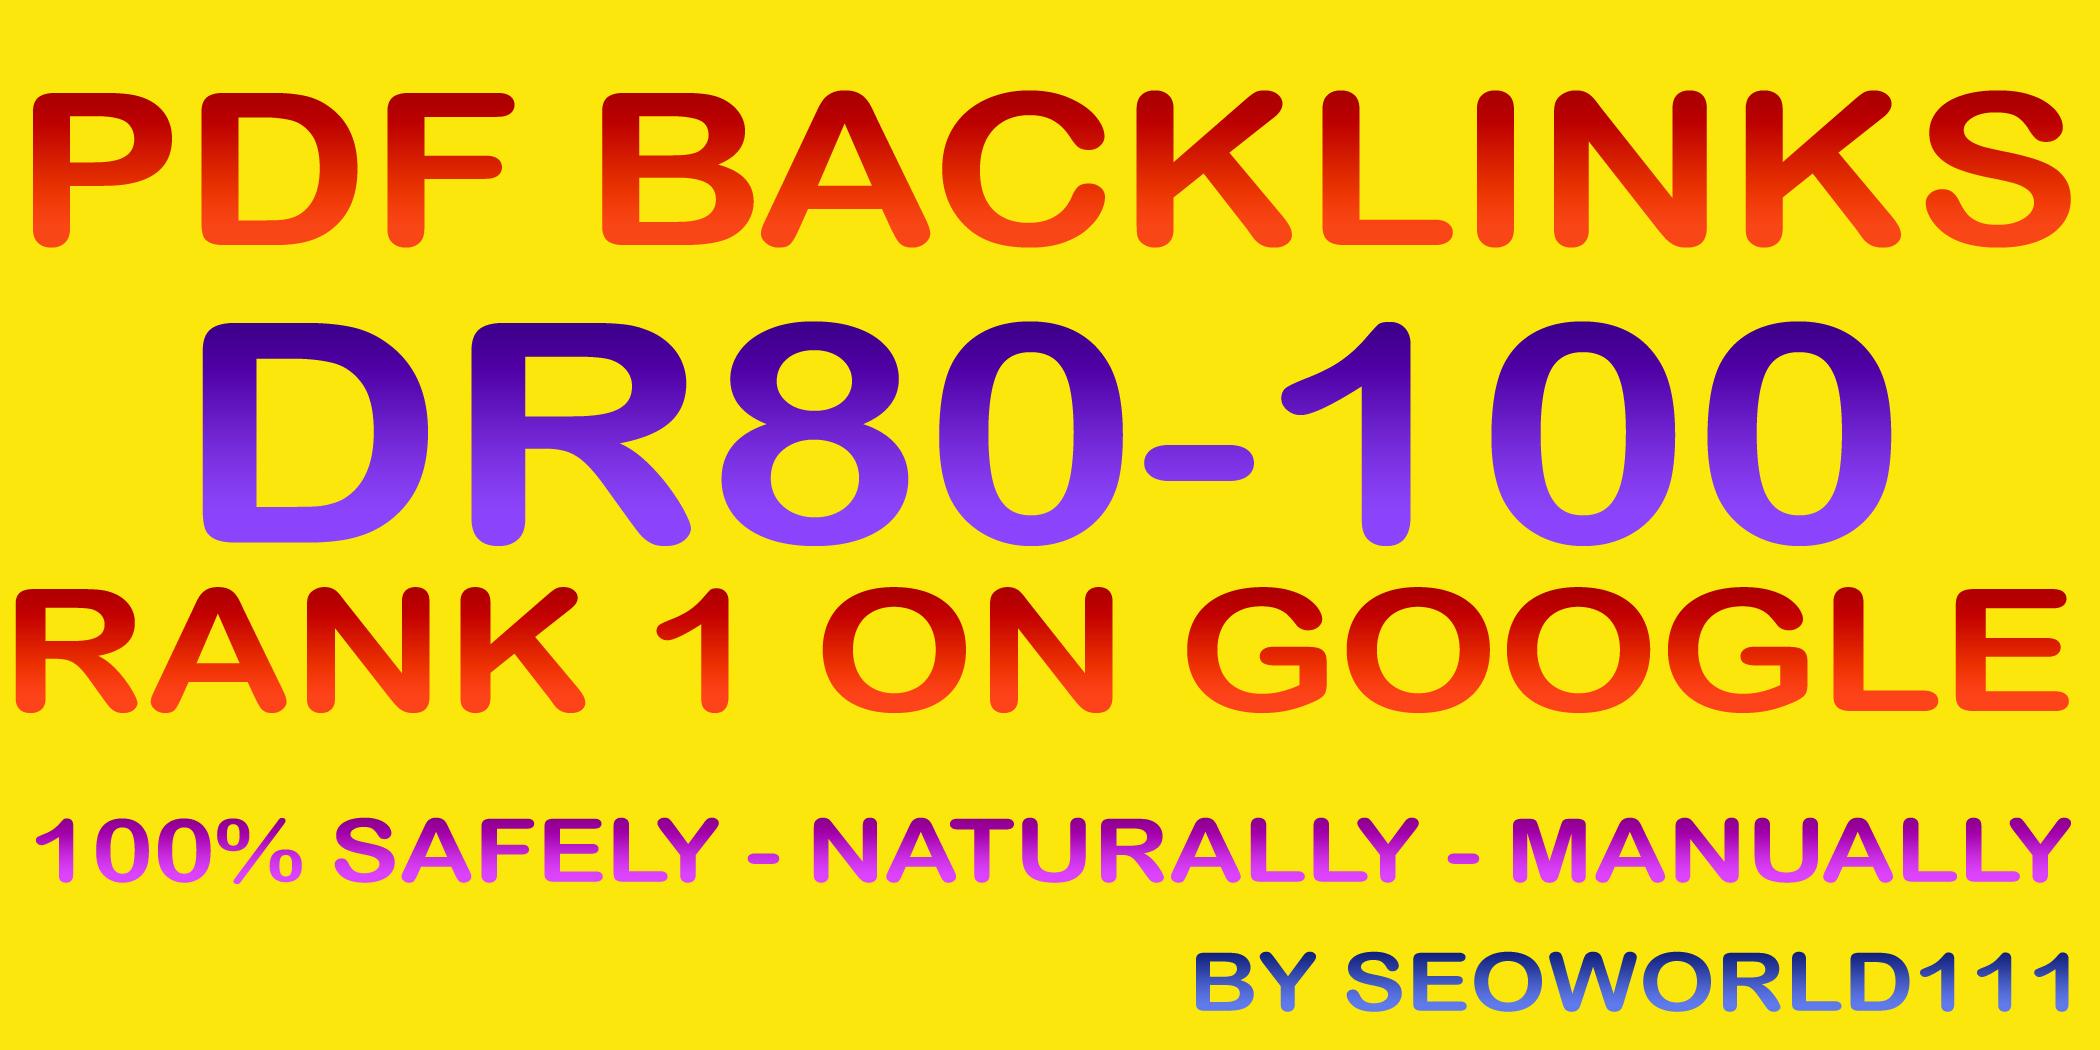 Exclusive 5 PDF Backlinks - DR80-100 - Rank 1 On Google